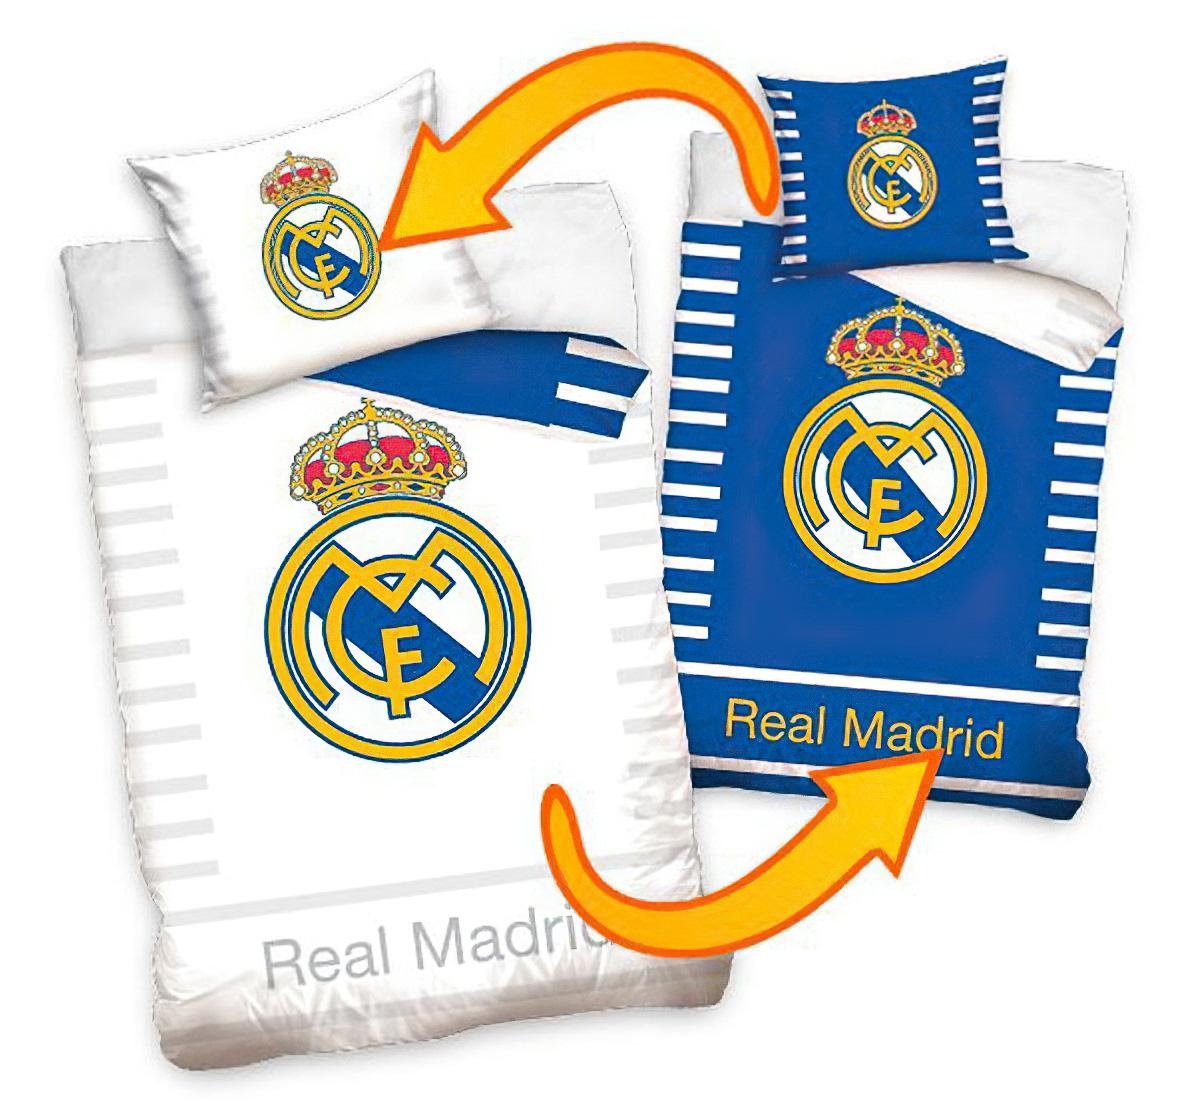 Fotbalové povlečení REAL MADRID DOUBLE bavlna hladká, 140x200cm + 70x80cm